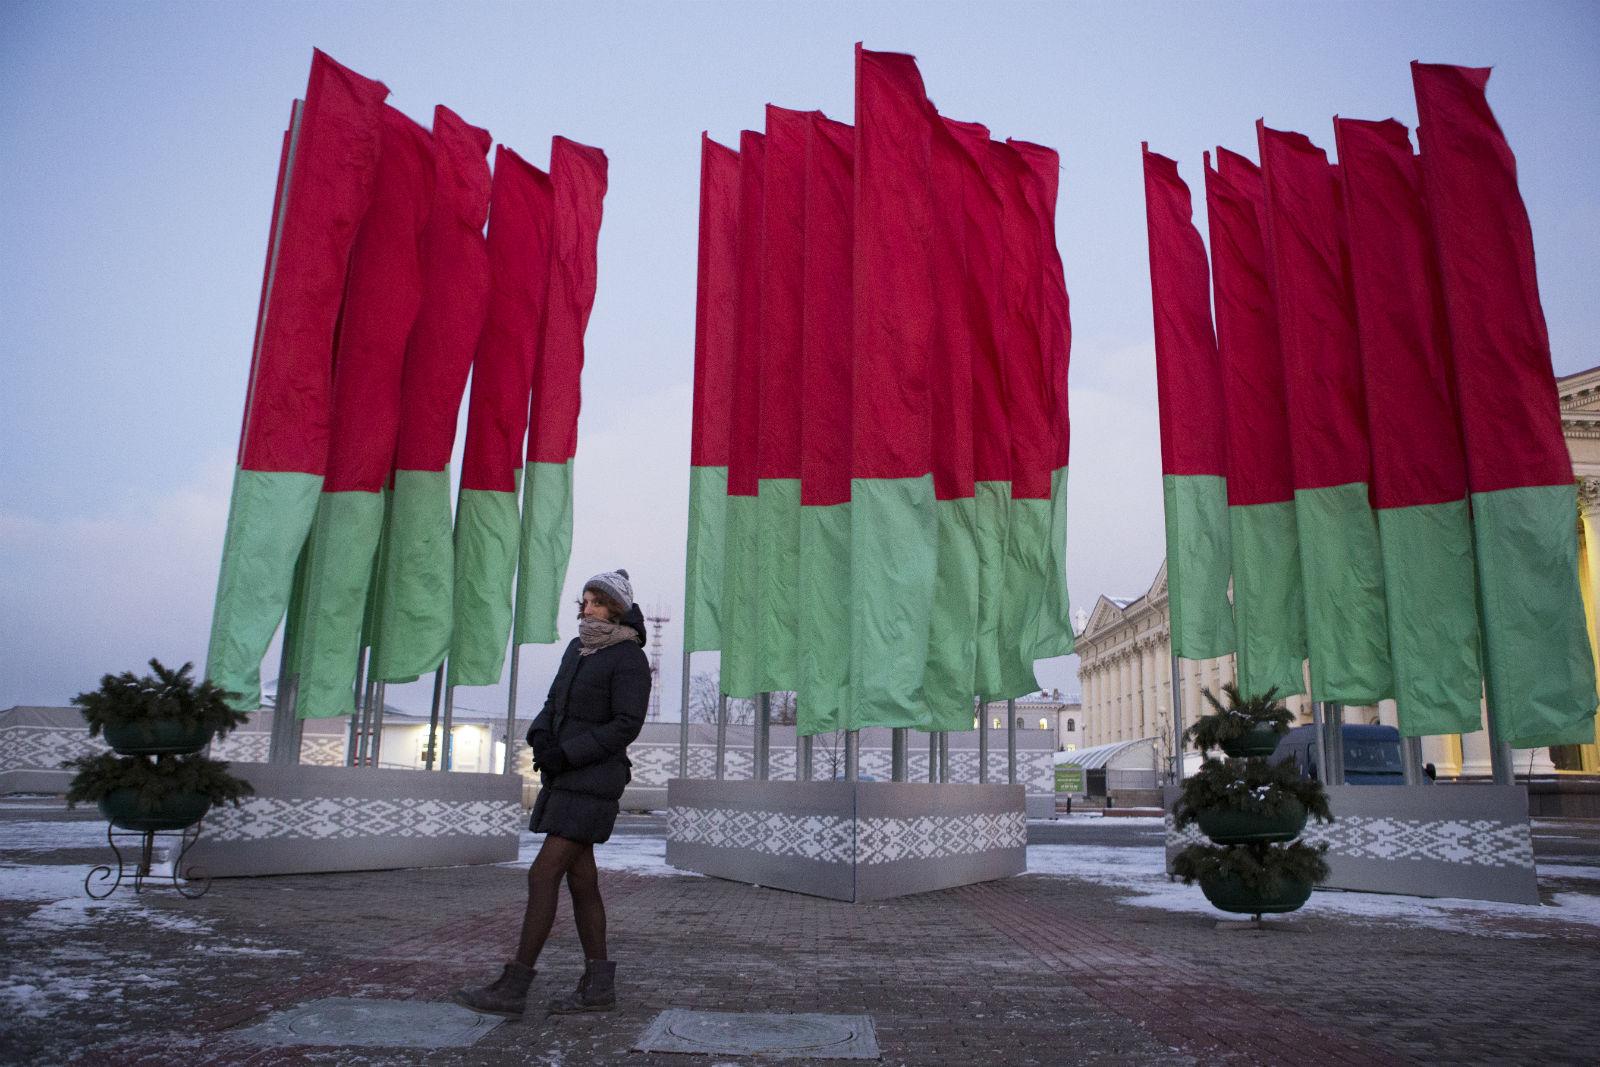 Alina cammina per la piazza Oktyabrskaya